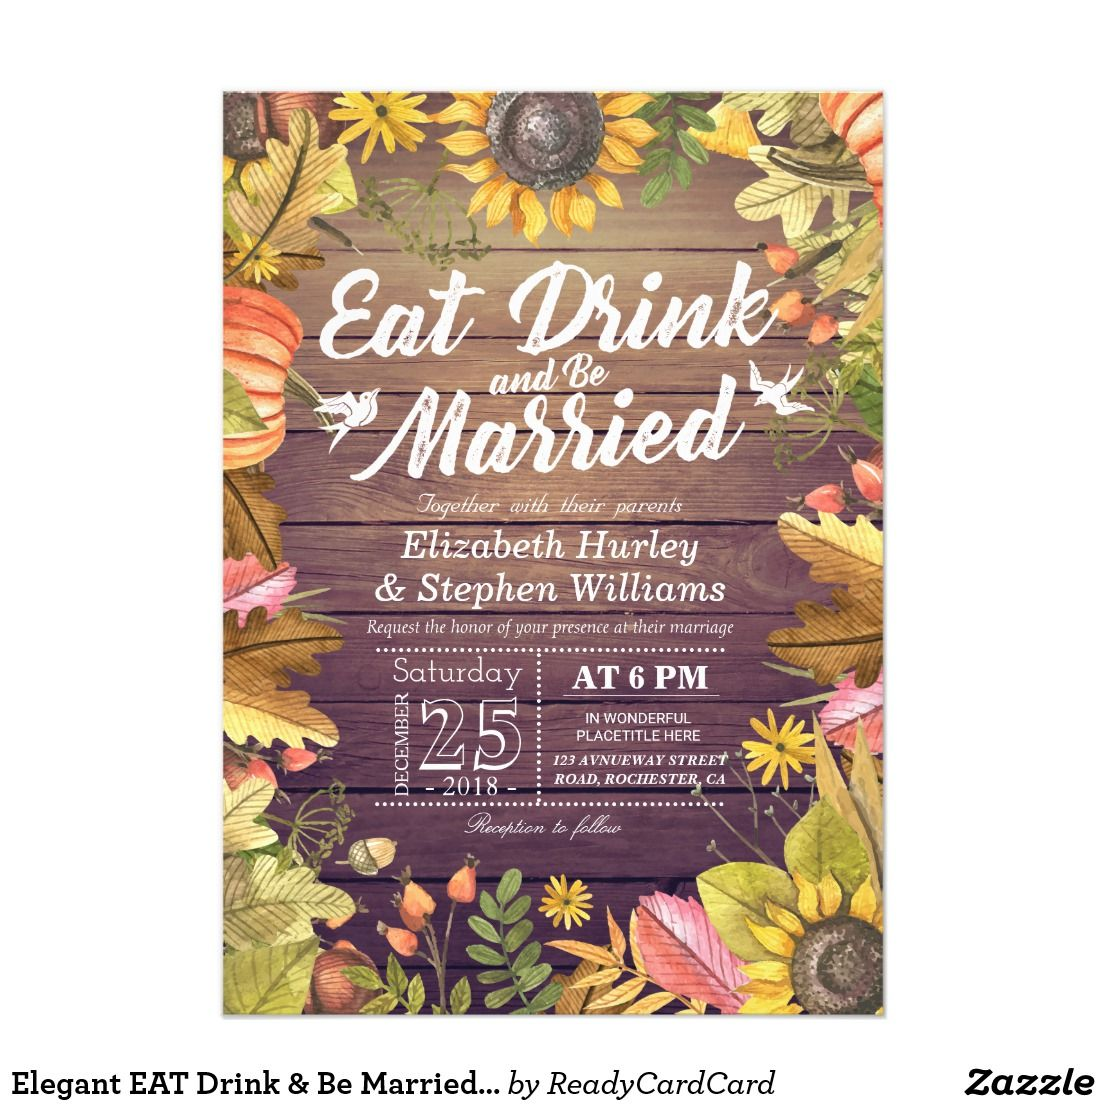 Wedding decorations for reception december 2018 Elegant EAT Drink u Be Married Wedding Invitations  Awesome Wedding